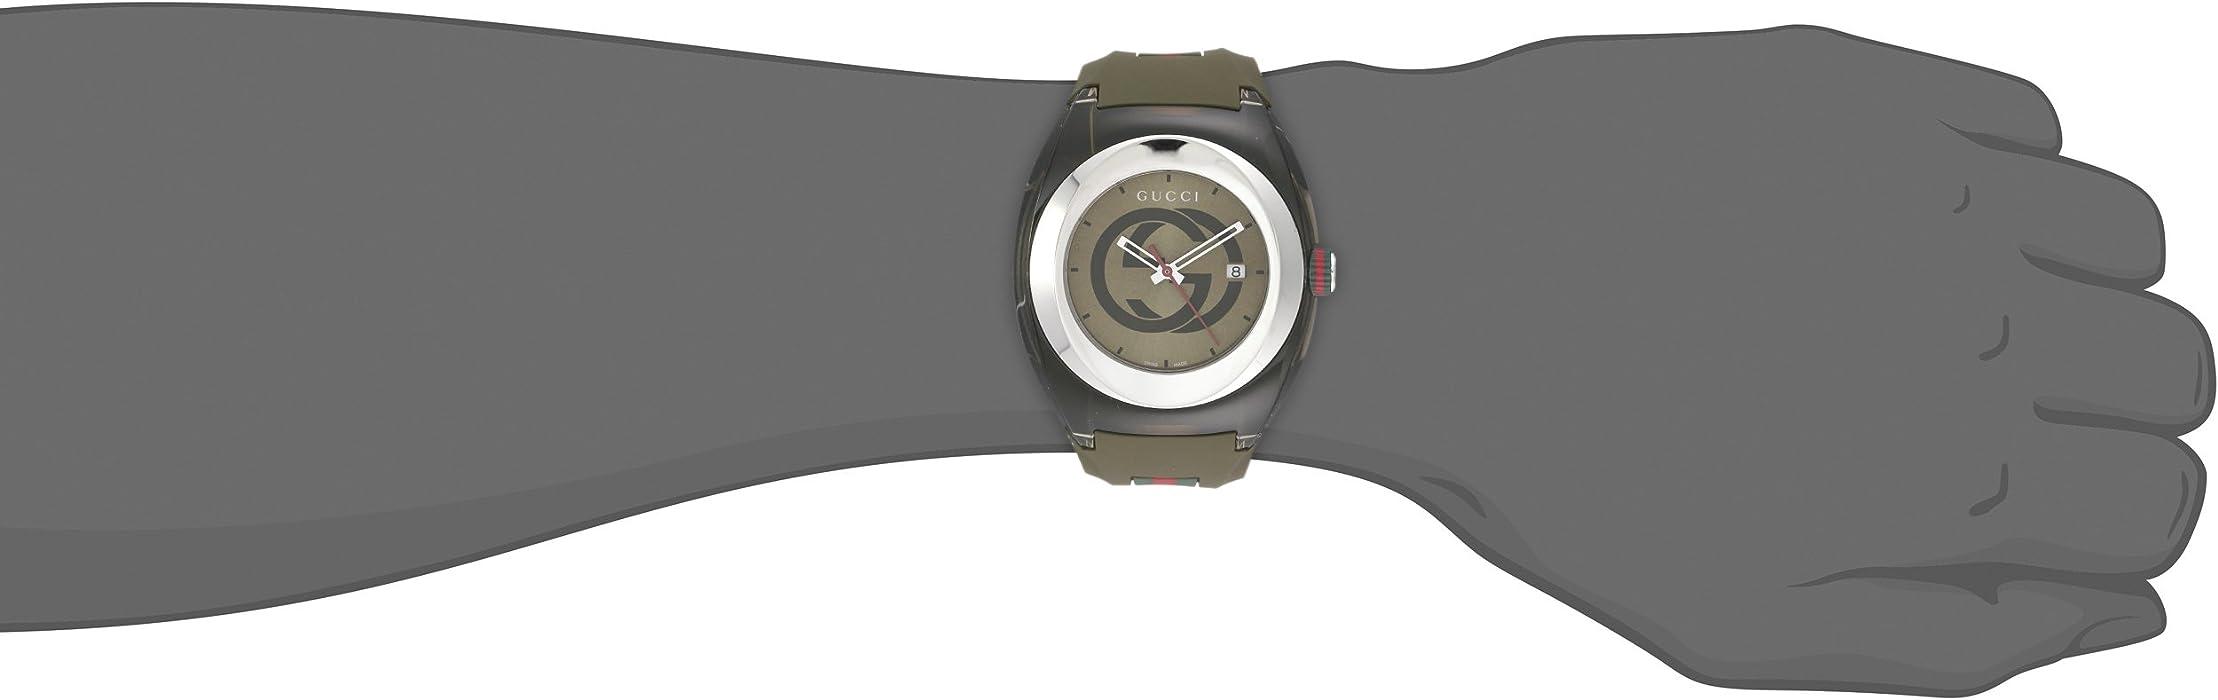 d0a96c0468c Amazon.com  Gucci SYNC XXL Khaki Watch(Model YA137106)  Watches